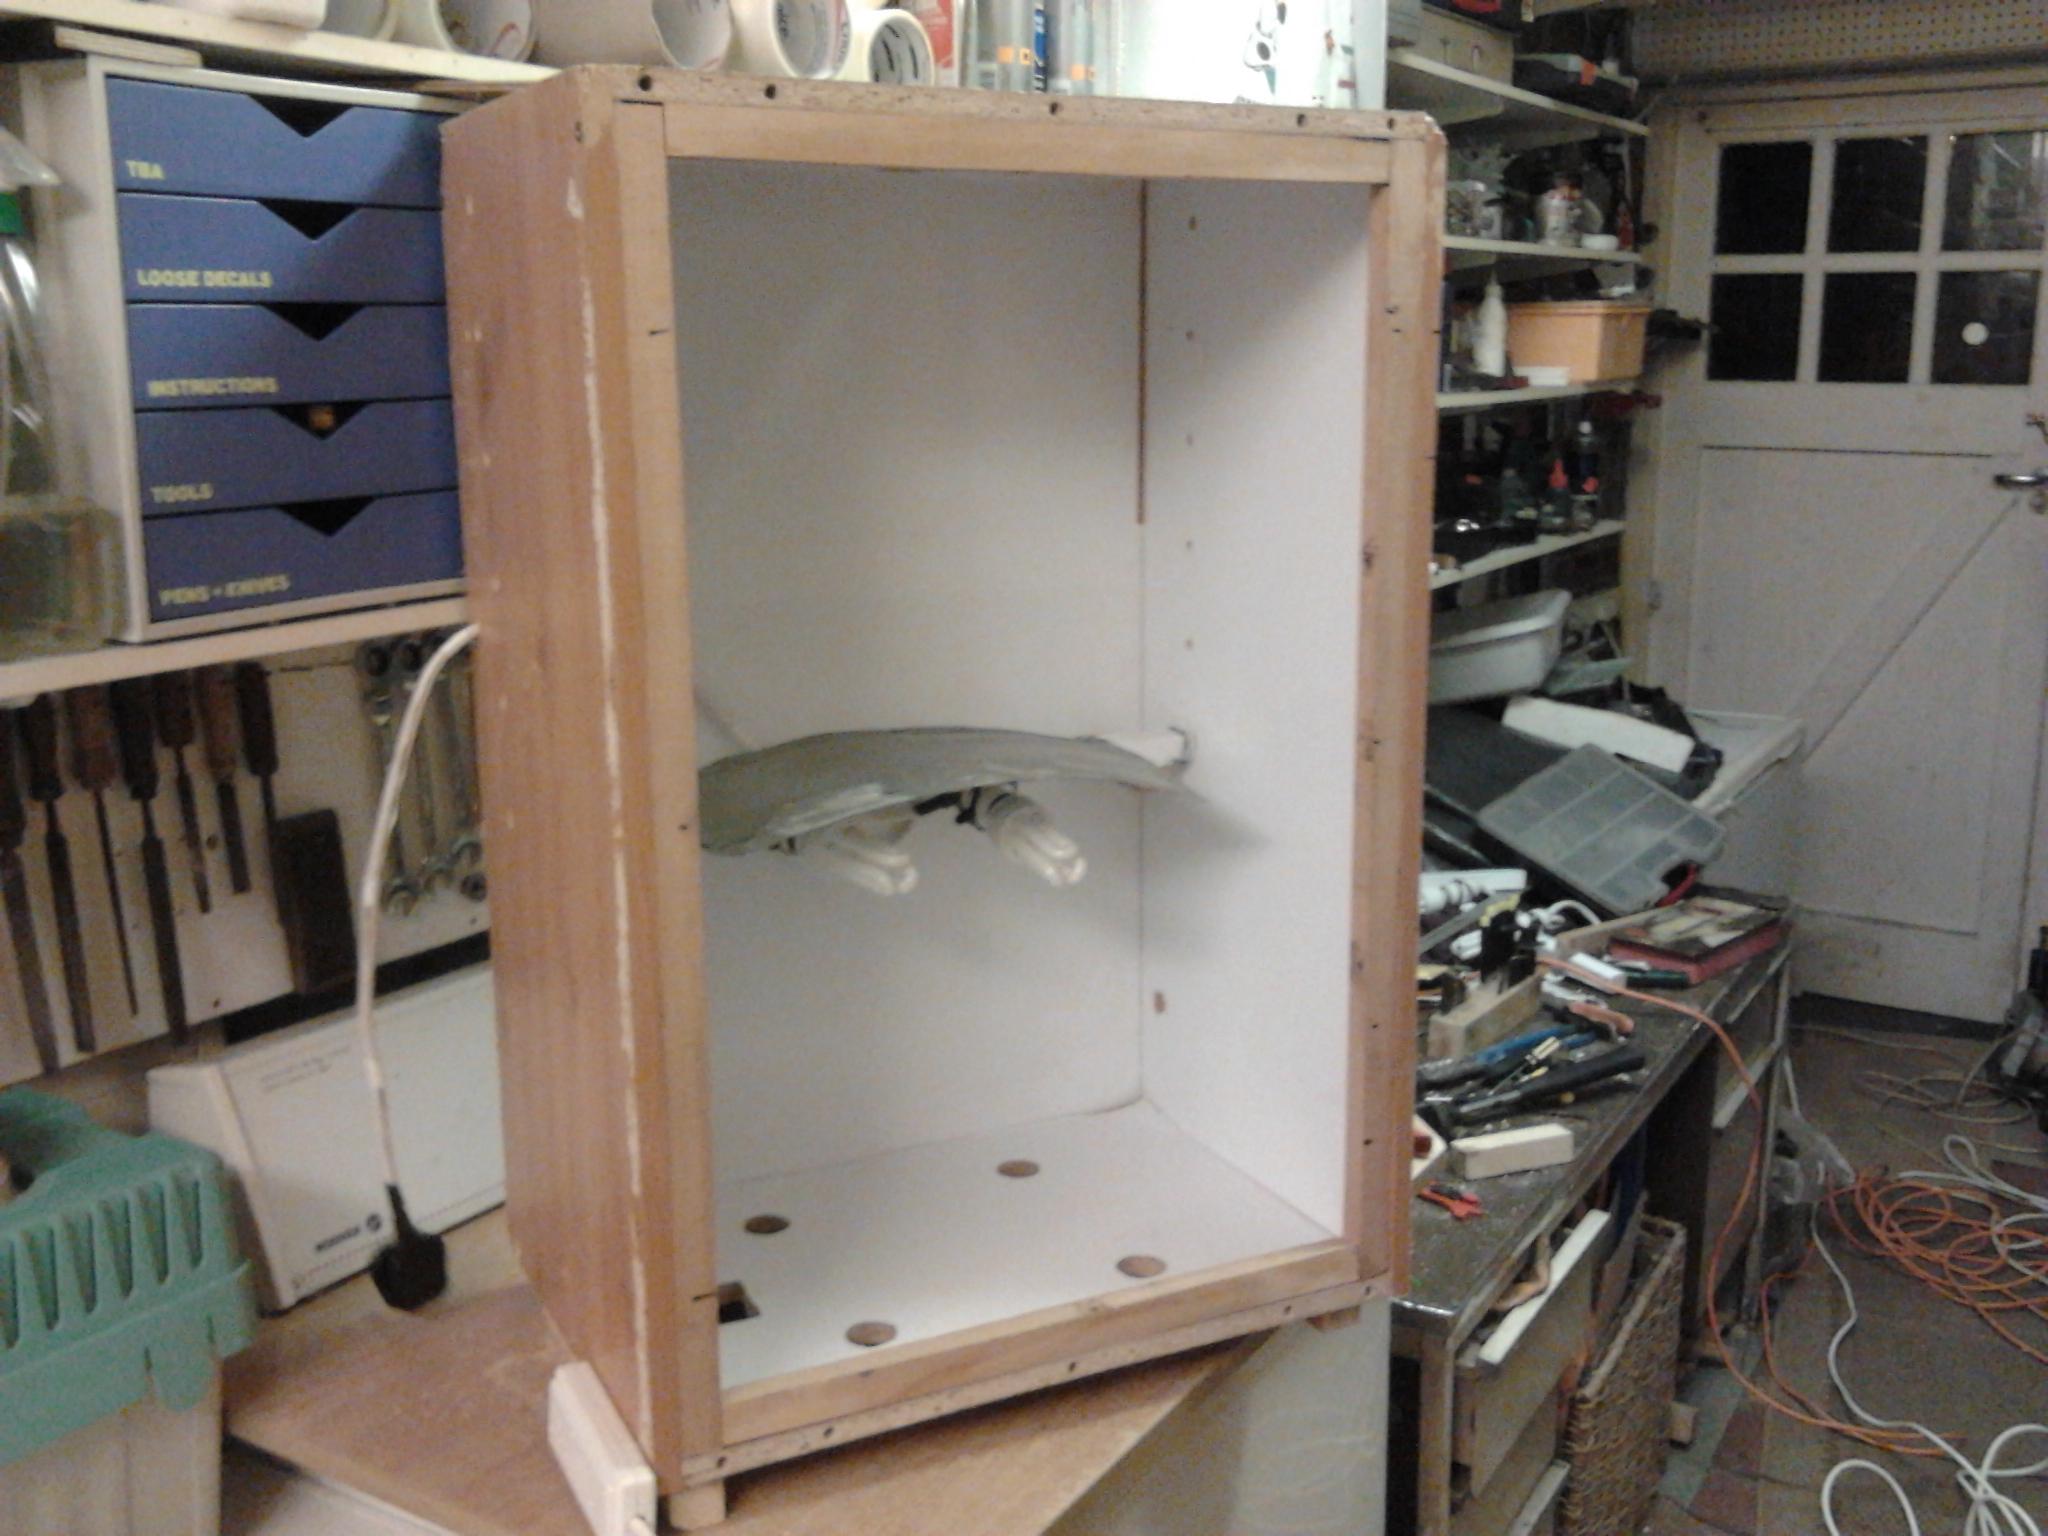 Mmmm new Project DIY Light Grow Box